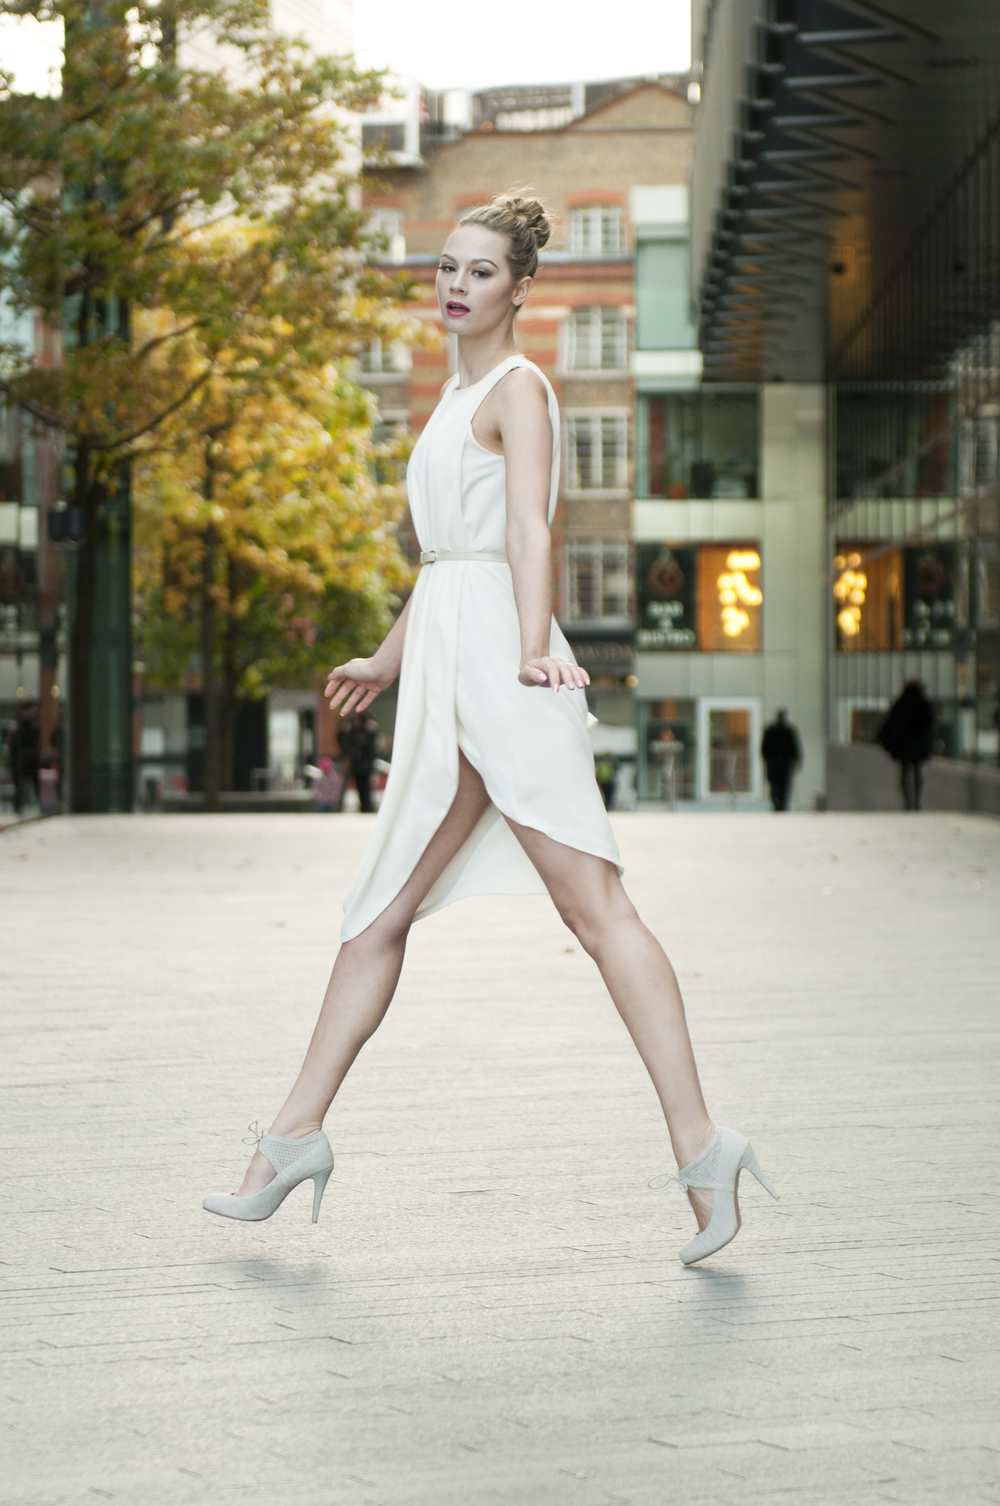 Isabel-wong-rose-white-georgette-memorie-dress-spring-summer-campaign.jpg